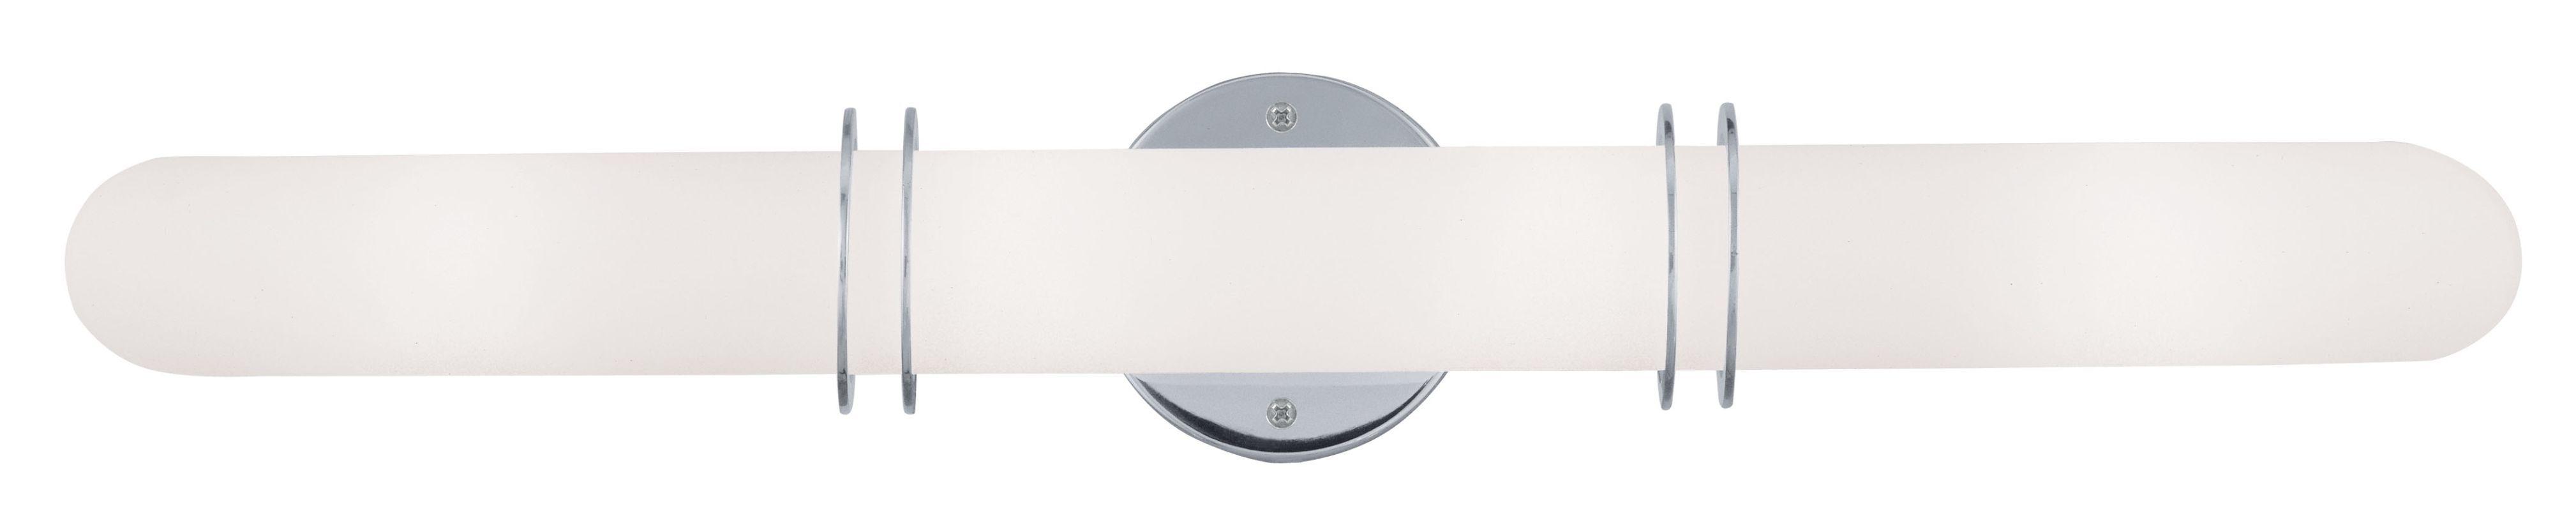 Photo of Livex Lighting 1904-05 Chrome Pelham 4 Light Bathroom Vanity Light